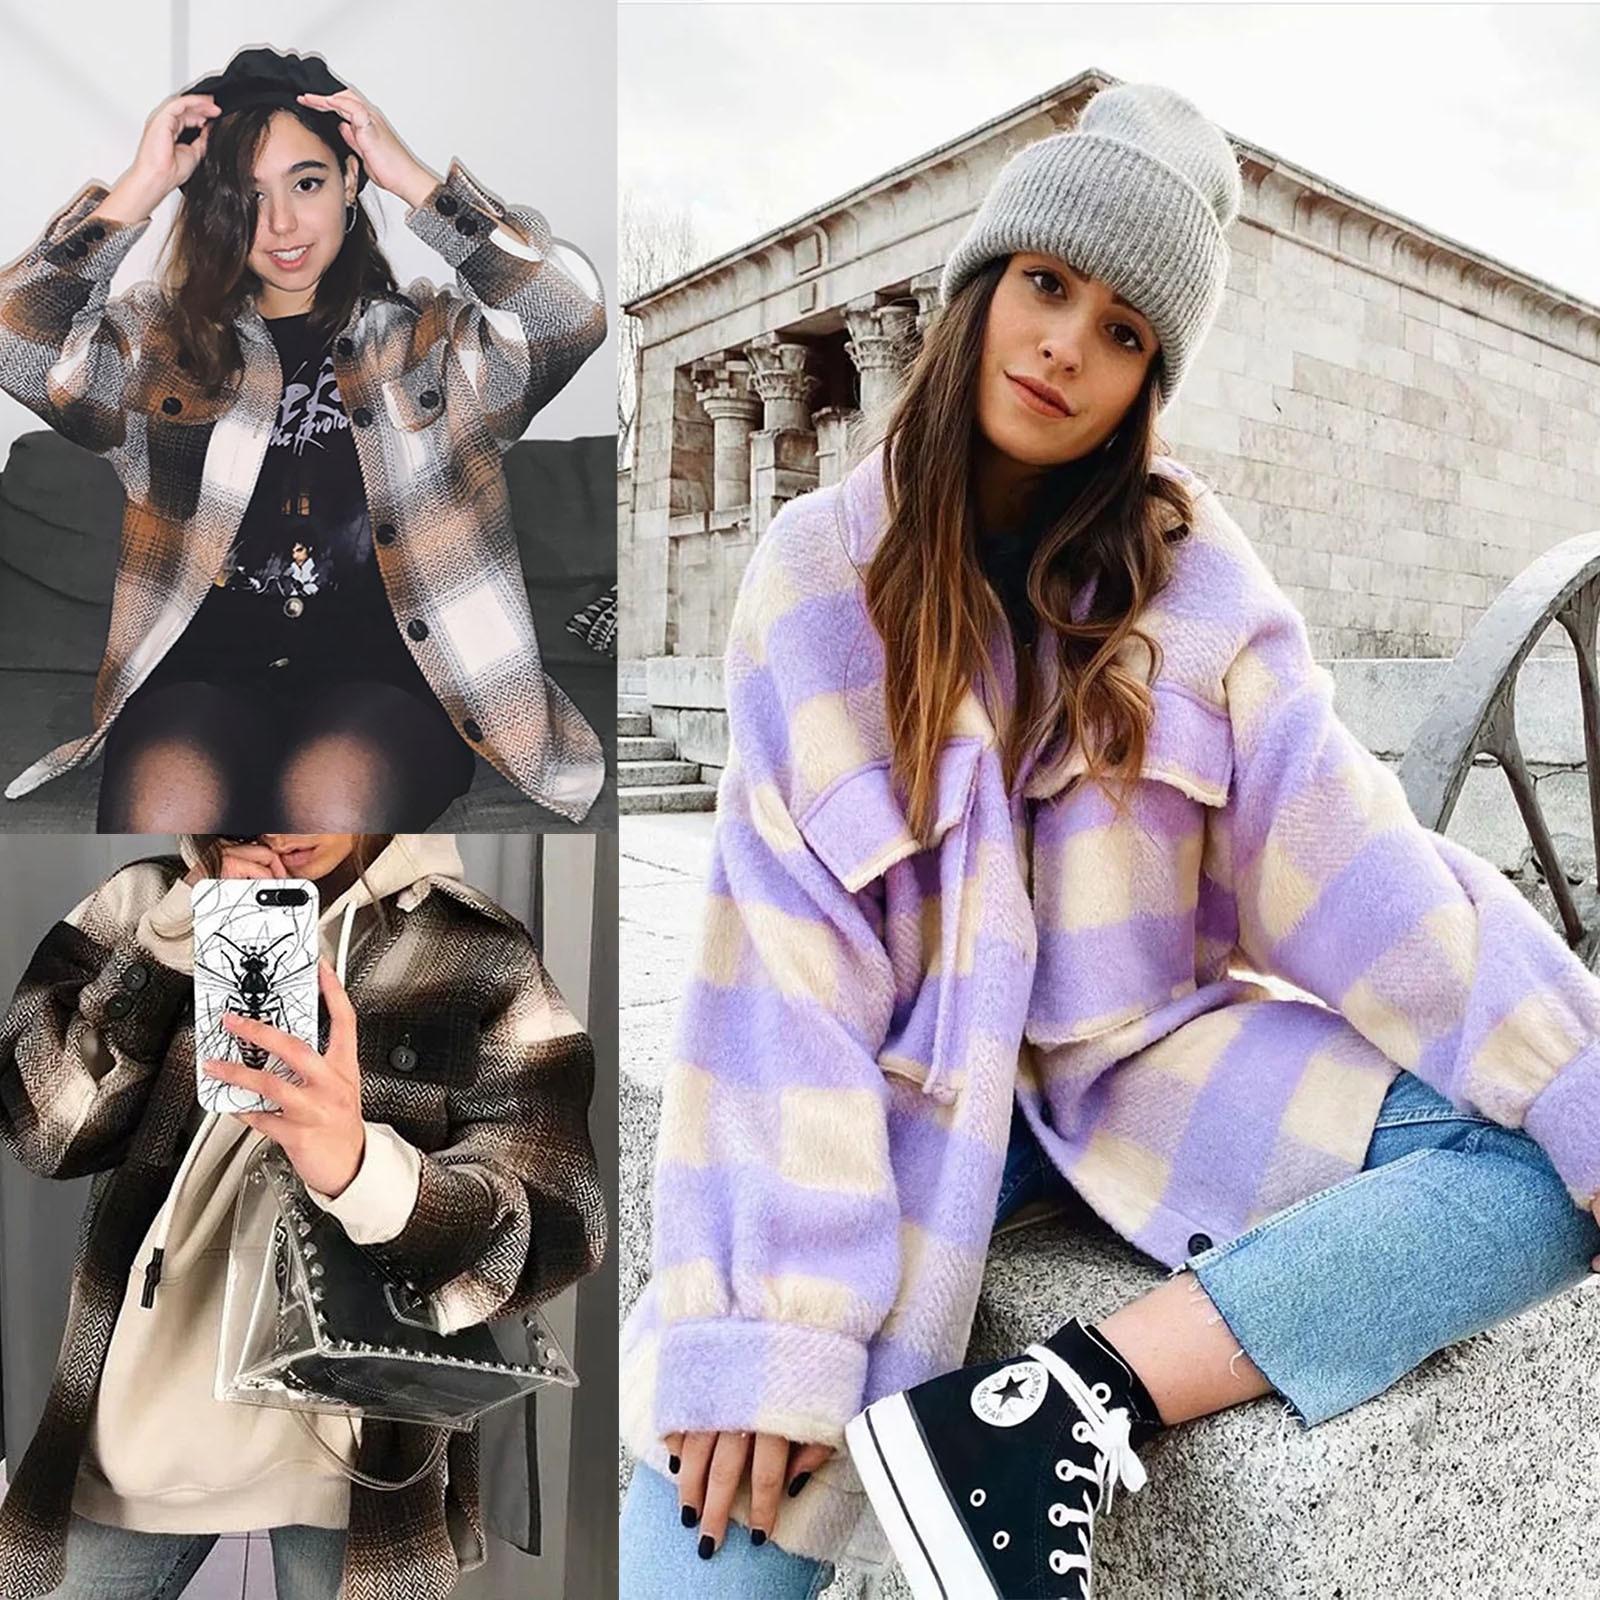 Abrigo de Invierno con capucha para Mujer, chaqueta cálida, abrigo cortavientos de...